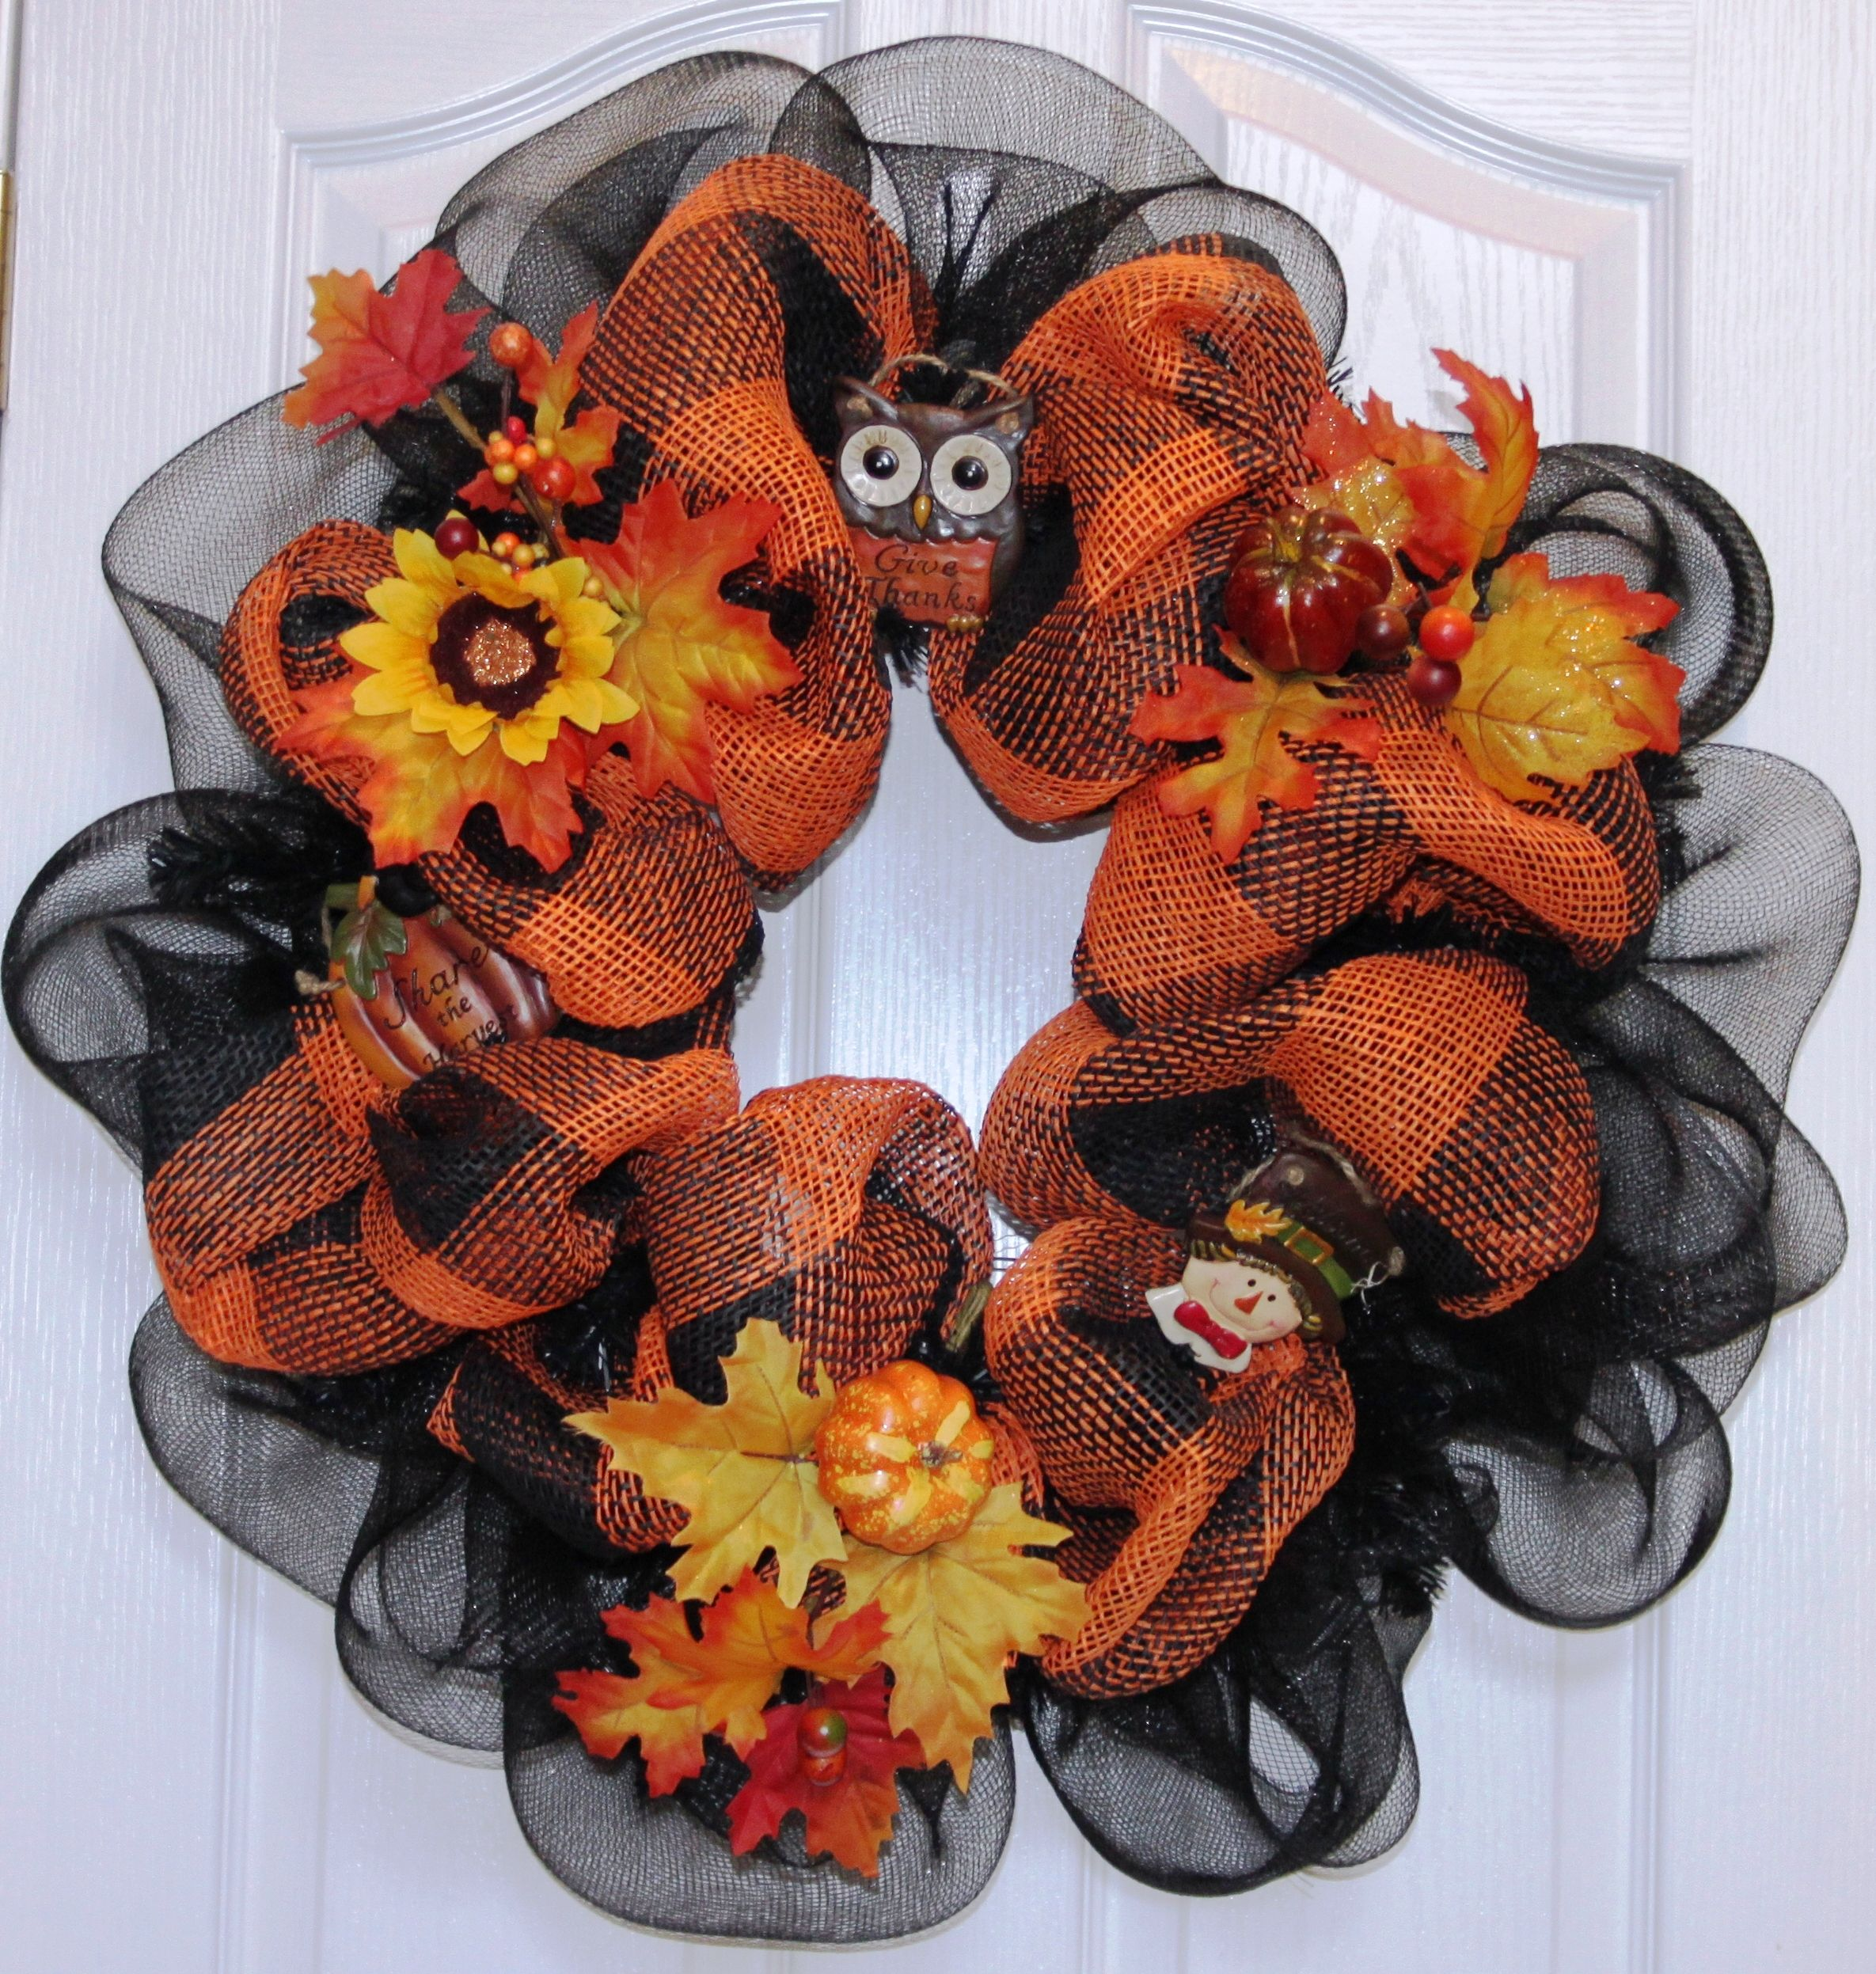 Pottery Barn Style Black Orange Deco Mesh Wreath Deco Mesh Wreaths Fall Wreaths Pottery Barn Style